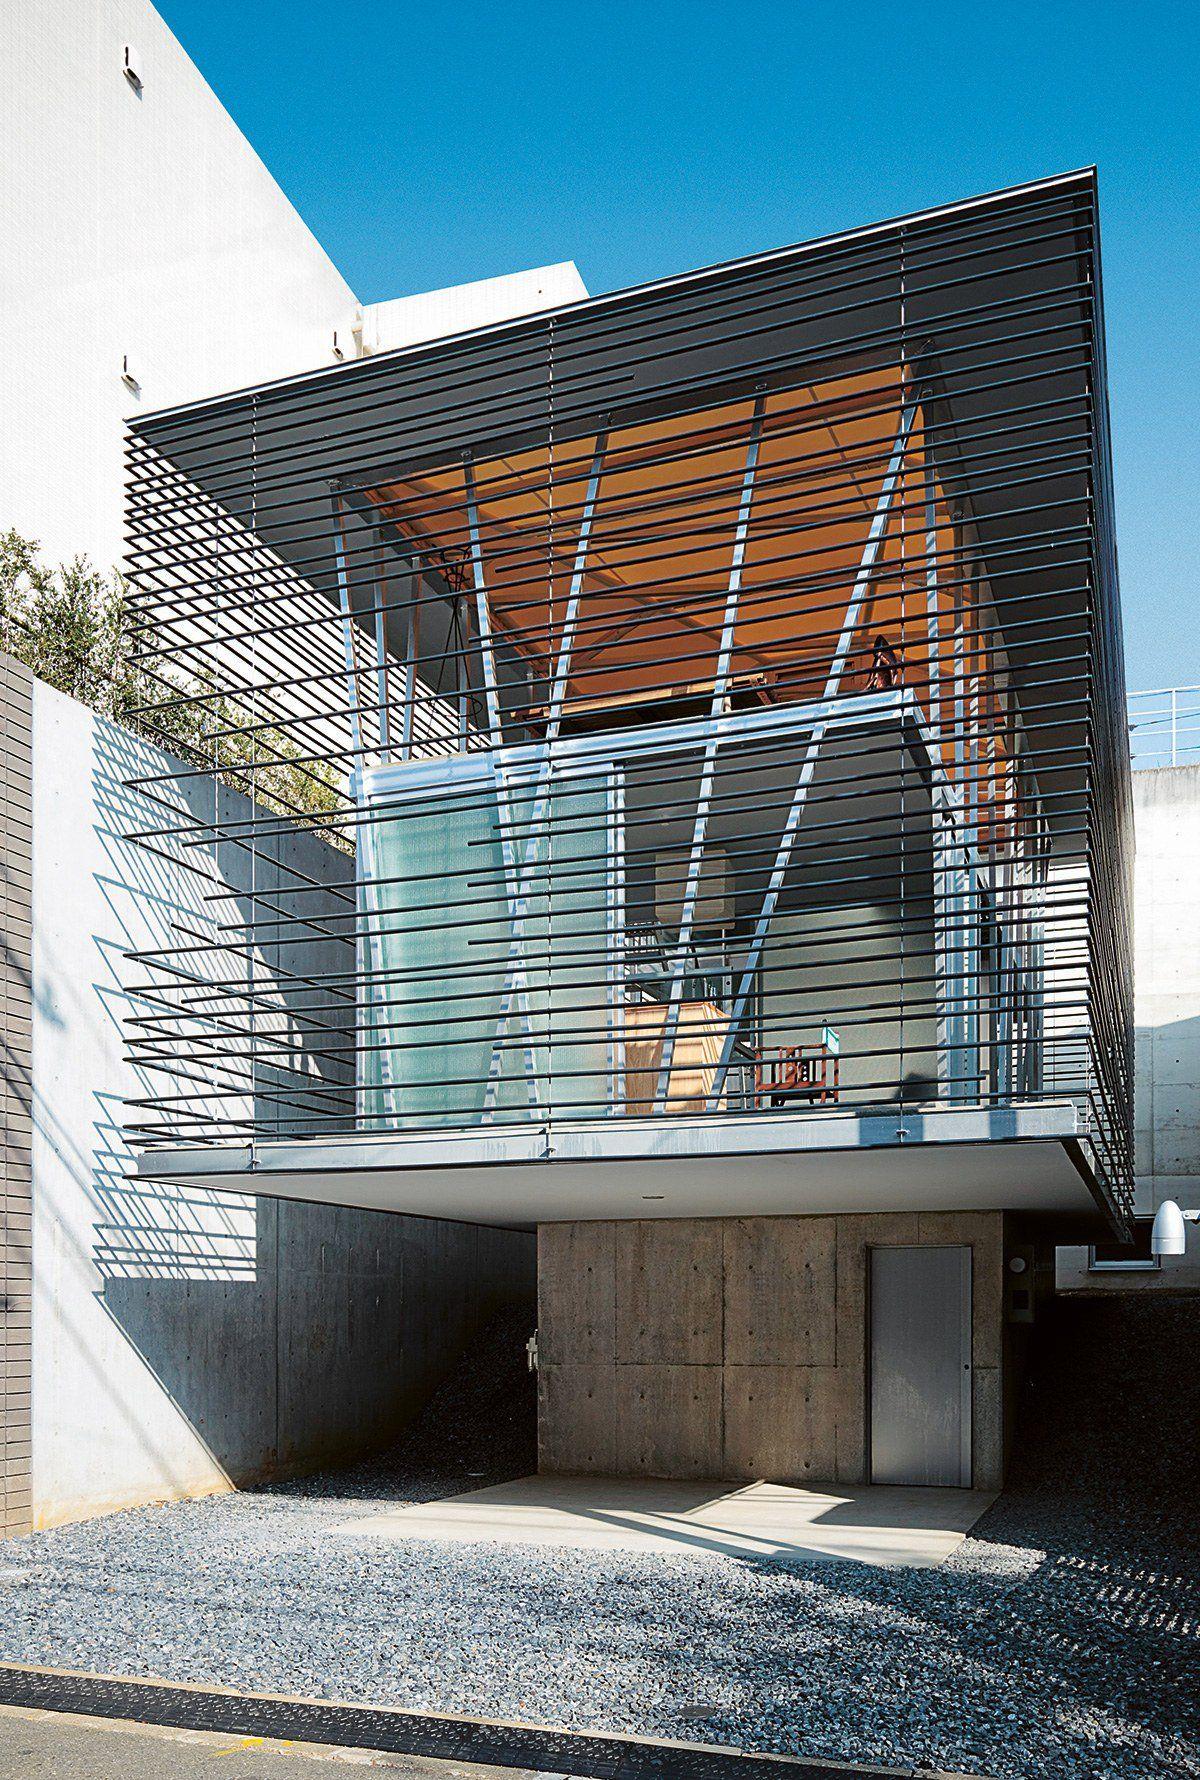 Hojo By Architecton, Shibuya Ku, Tokyo Prefecture, Featured In Jutaku Japanese